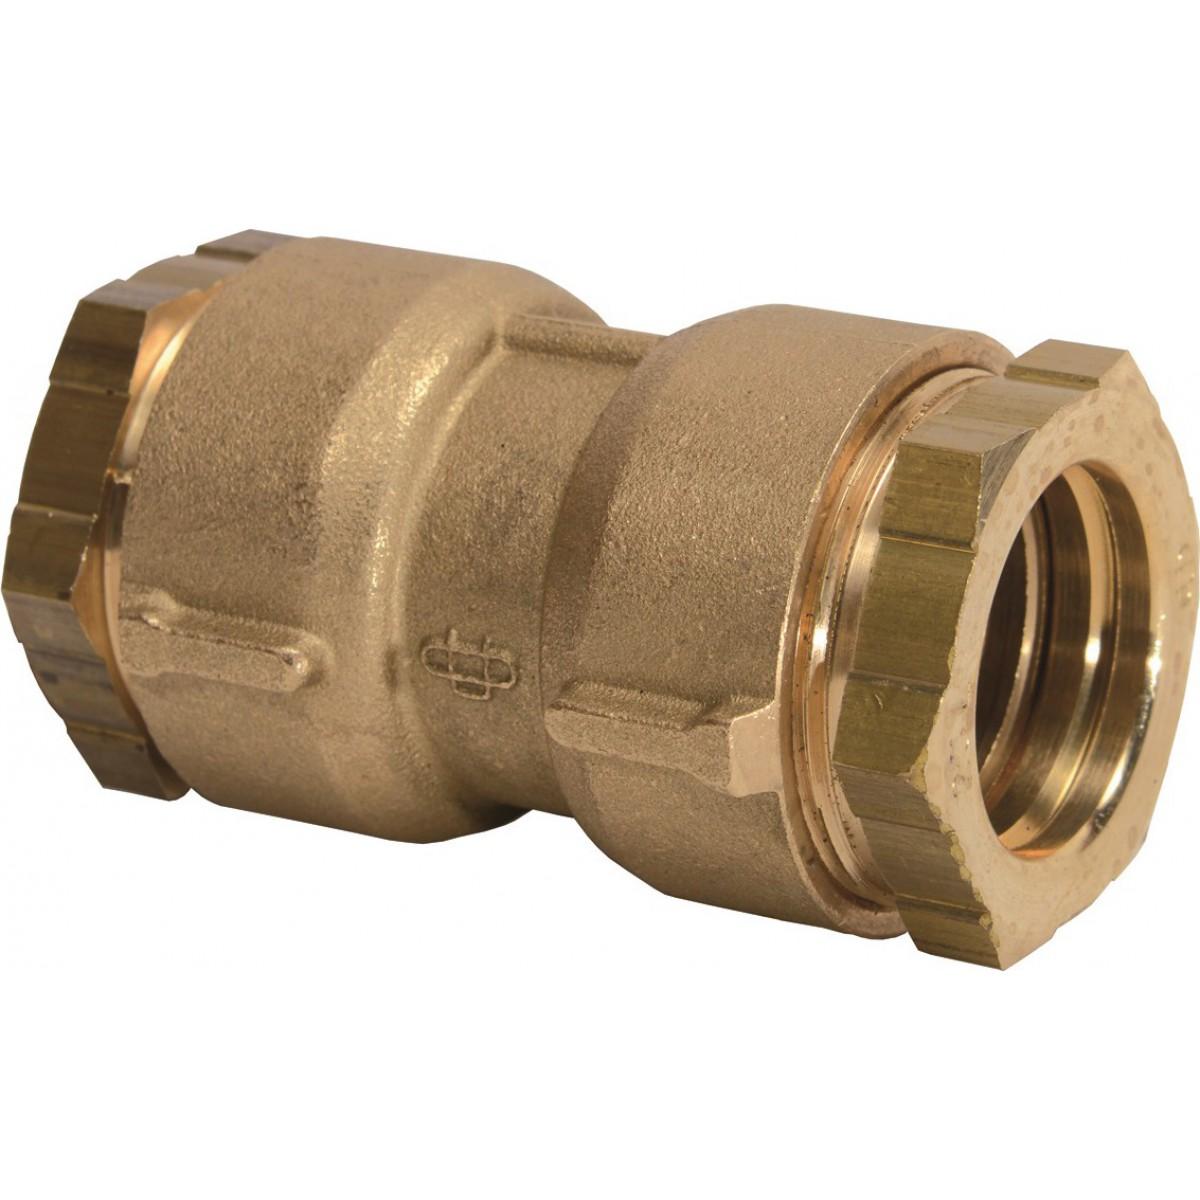 Raccord PE droit à serrage - Femelle - Ø 32 mm - Rexuo - Huot